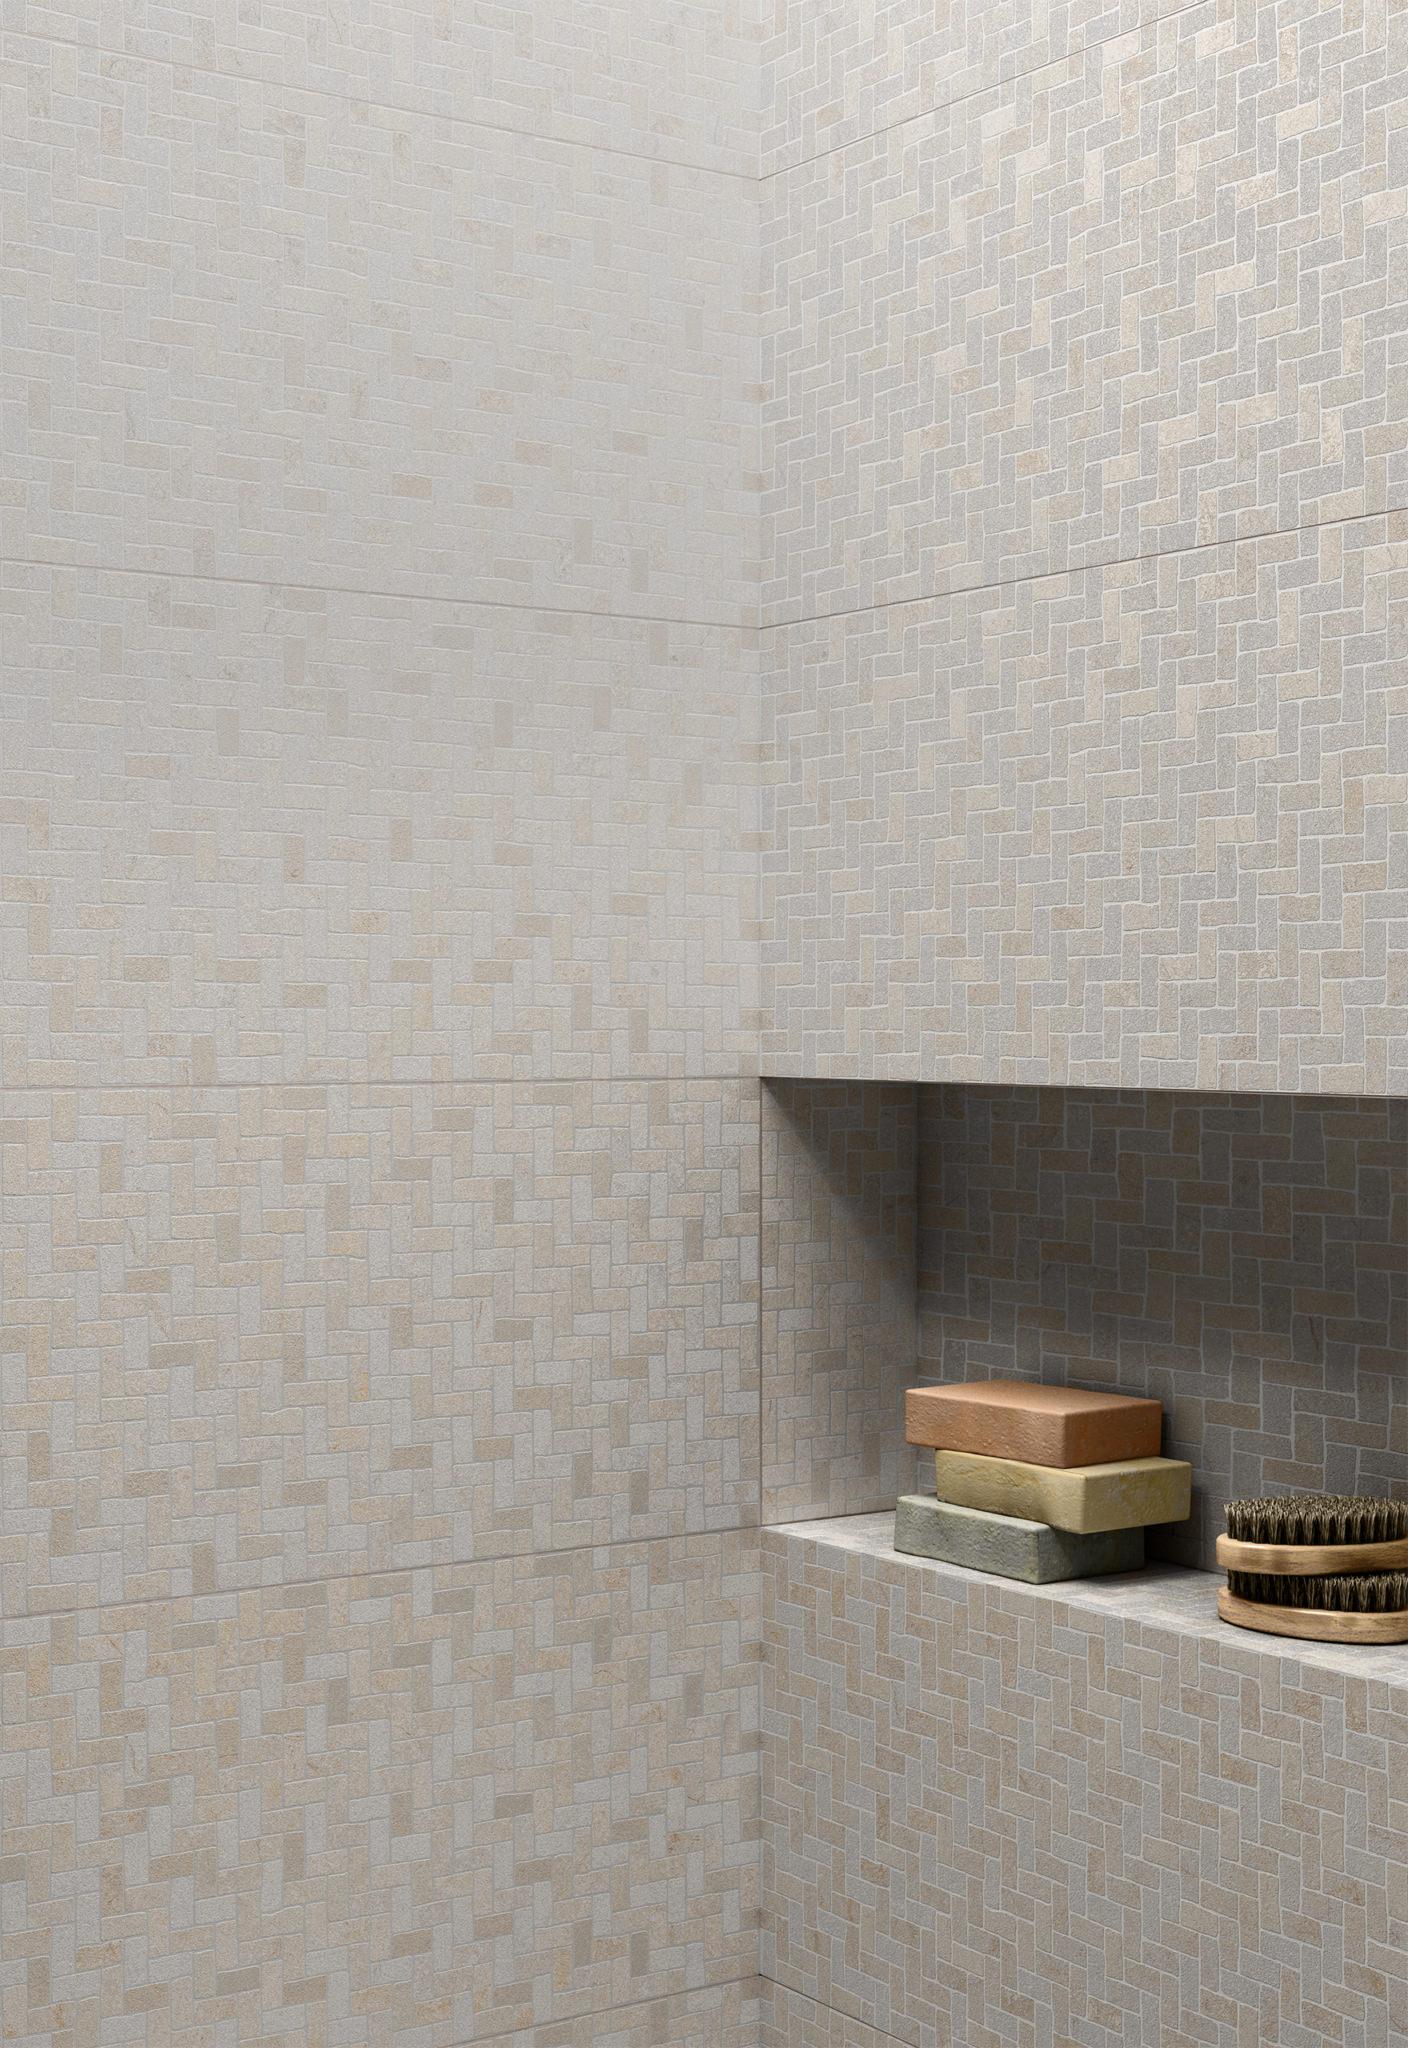 Rendering bagno con lastre ceramica